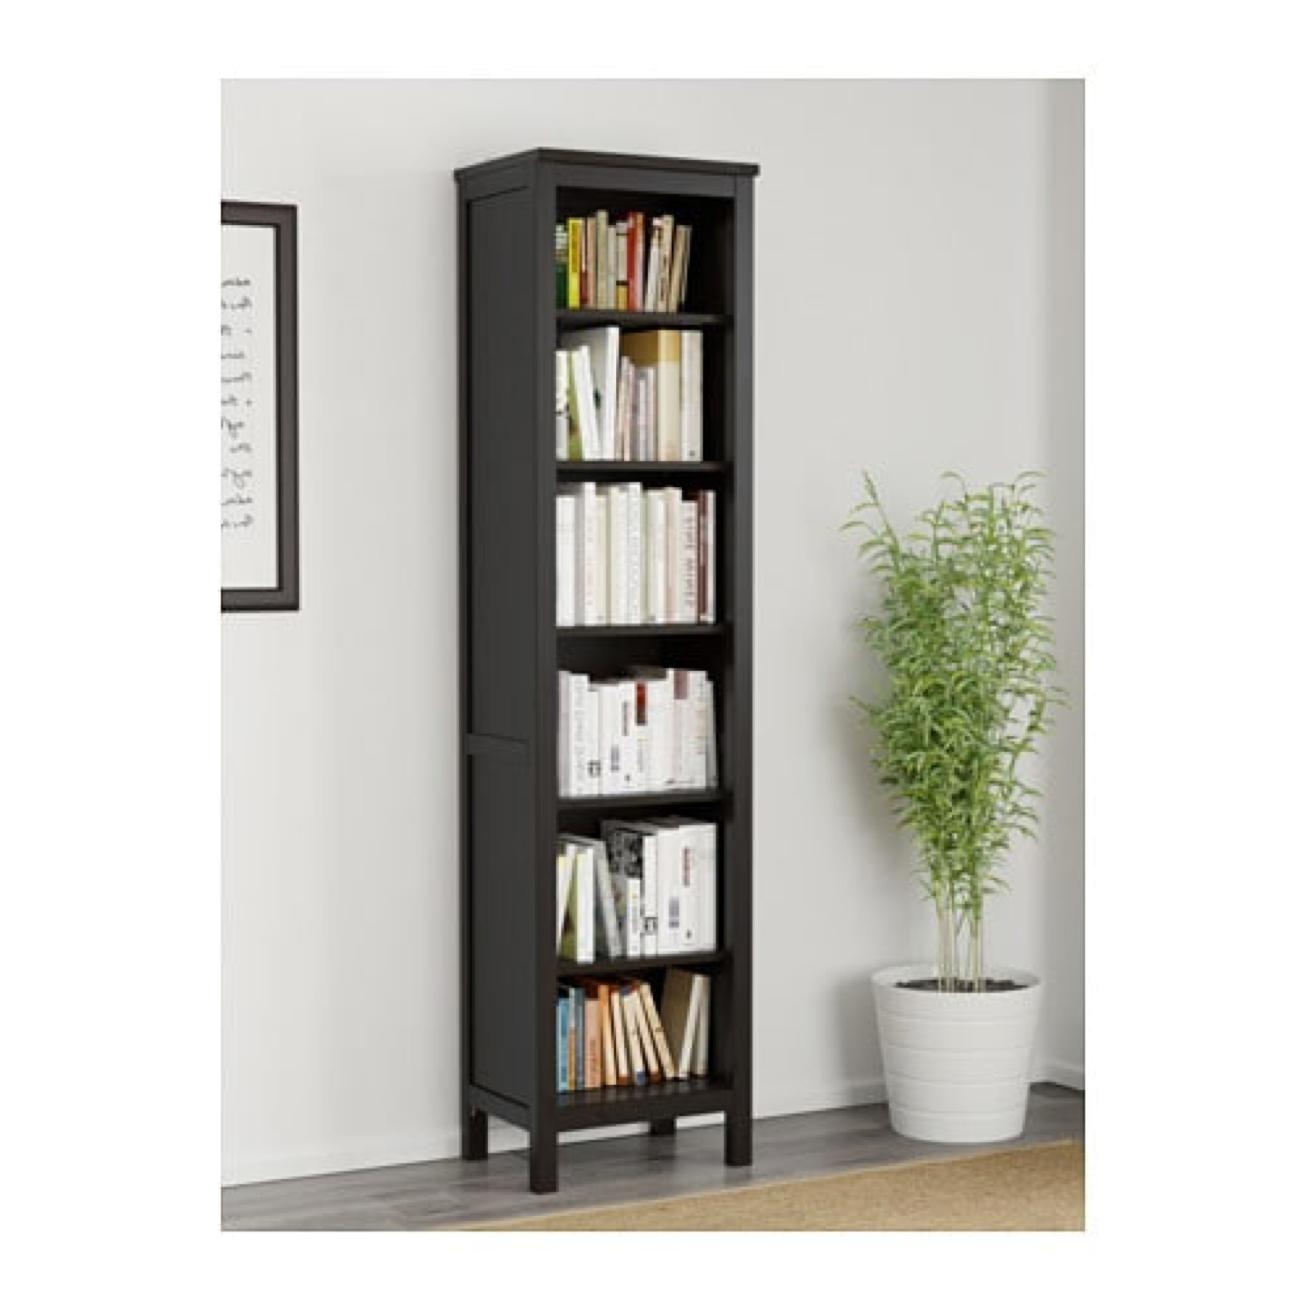 Ikea Hemnes Bookcase Black Brown 603 717 62